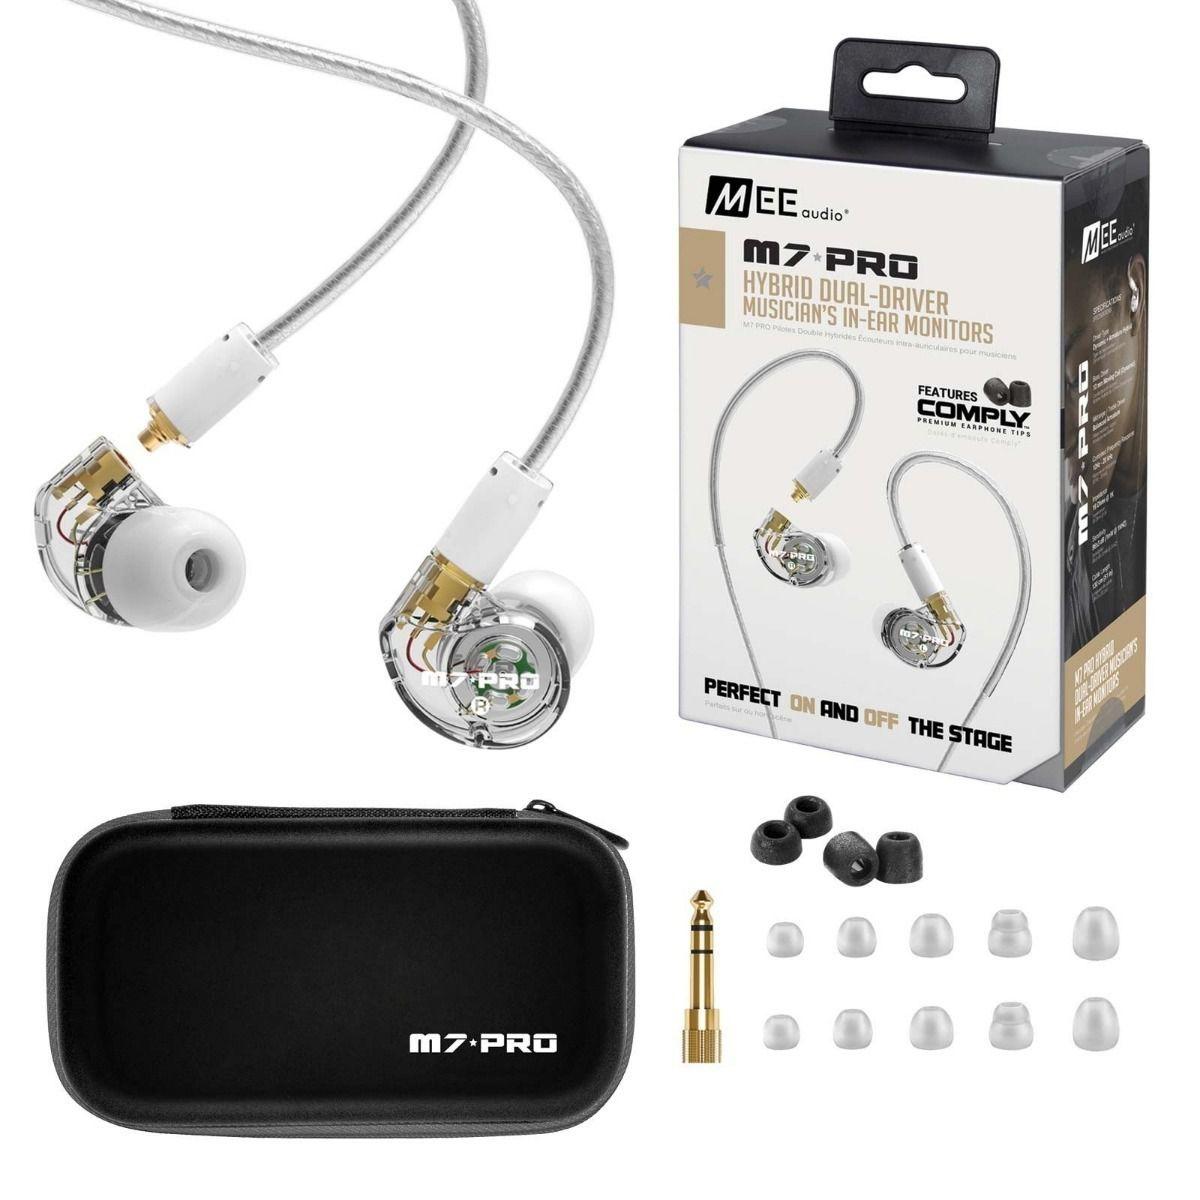 Fone de ouvido Mee Audio M7 PRO transparente (openbox)